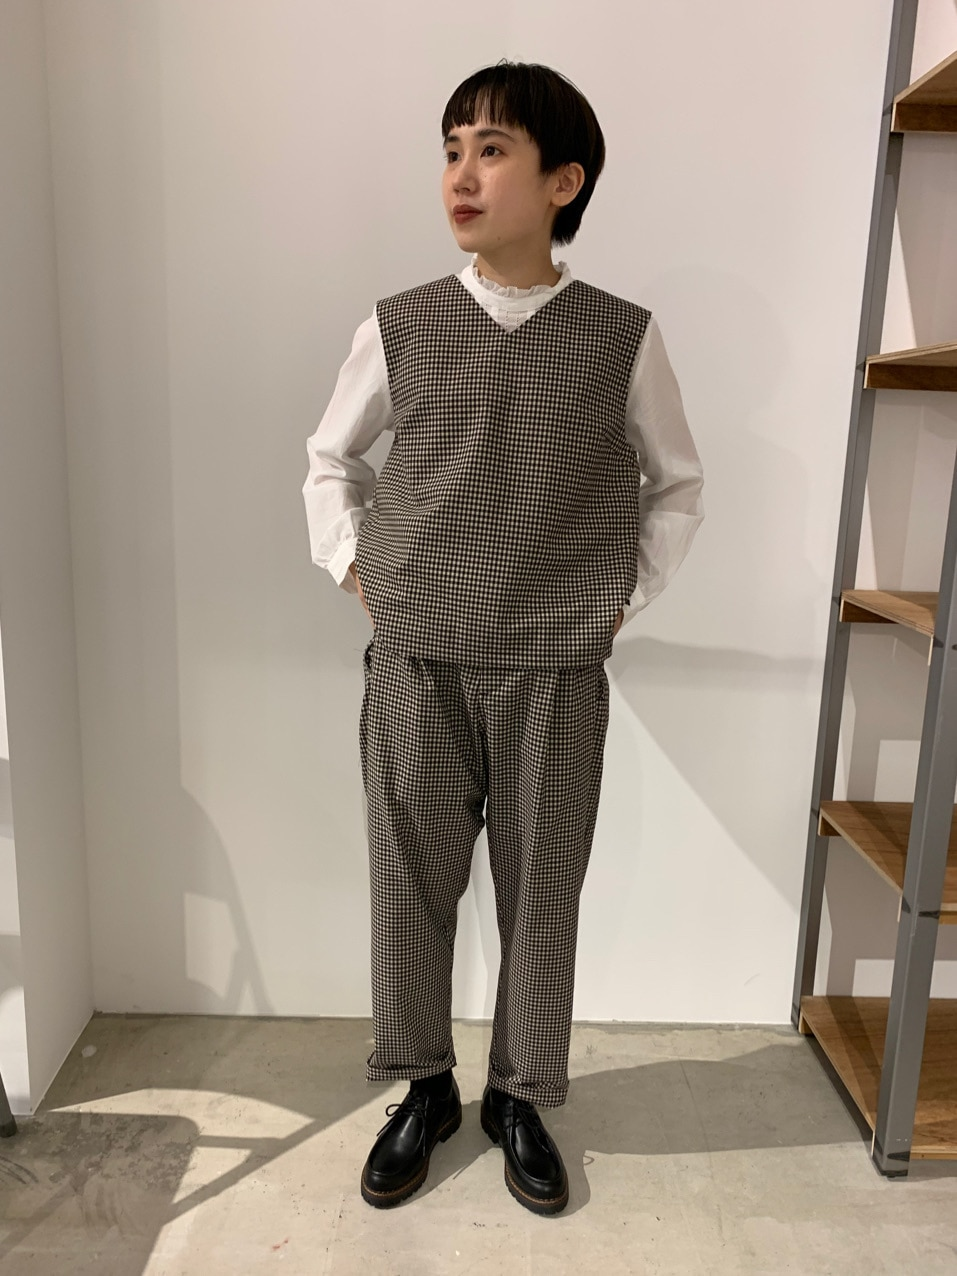 FLAT AMB 名古屋栄路面 2020.09.30